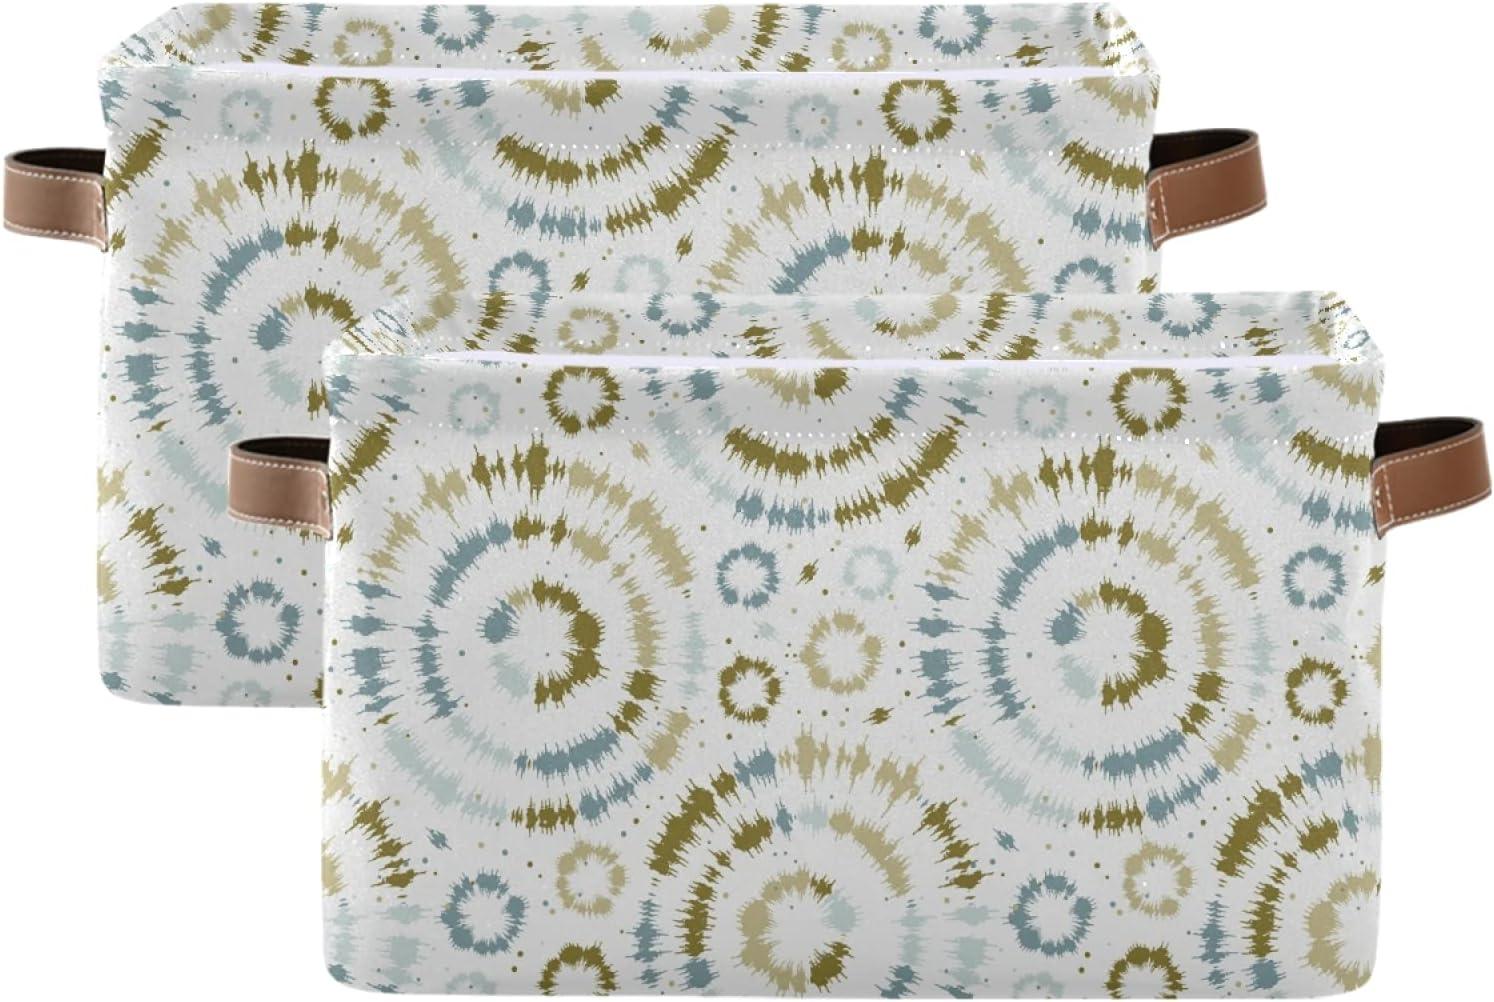 Large Foldable Storage Bin Tie Limited Special Price [Alternative dealer] Sunburst Circle Shibori Fabri Dye